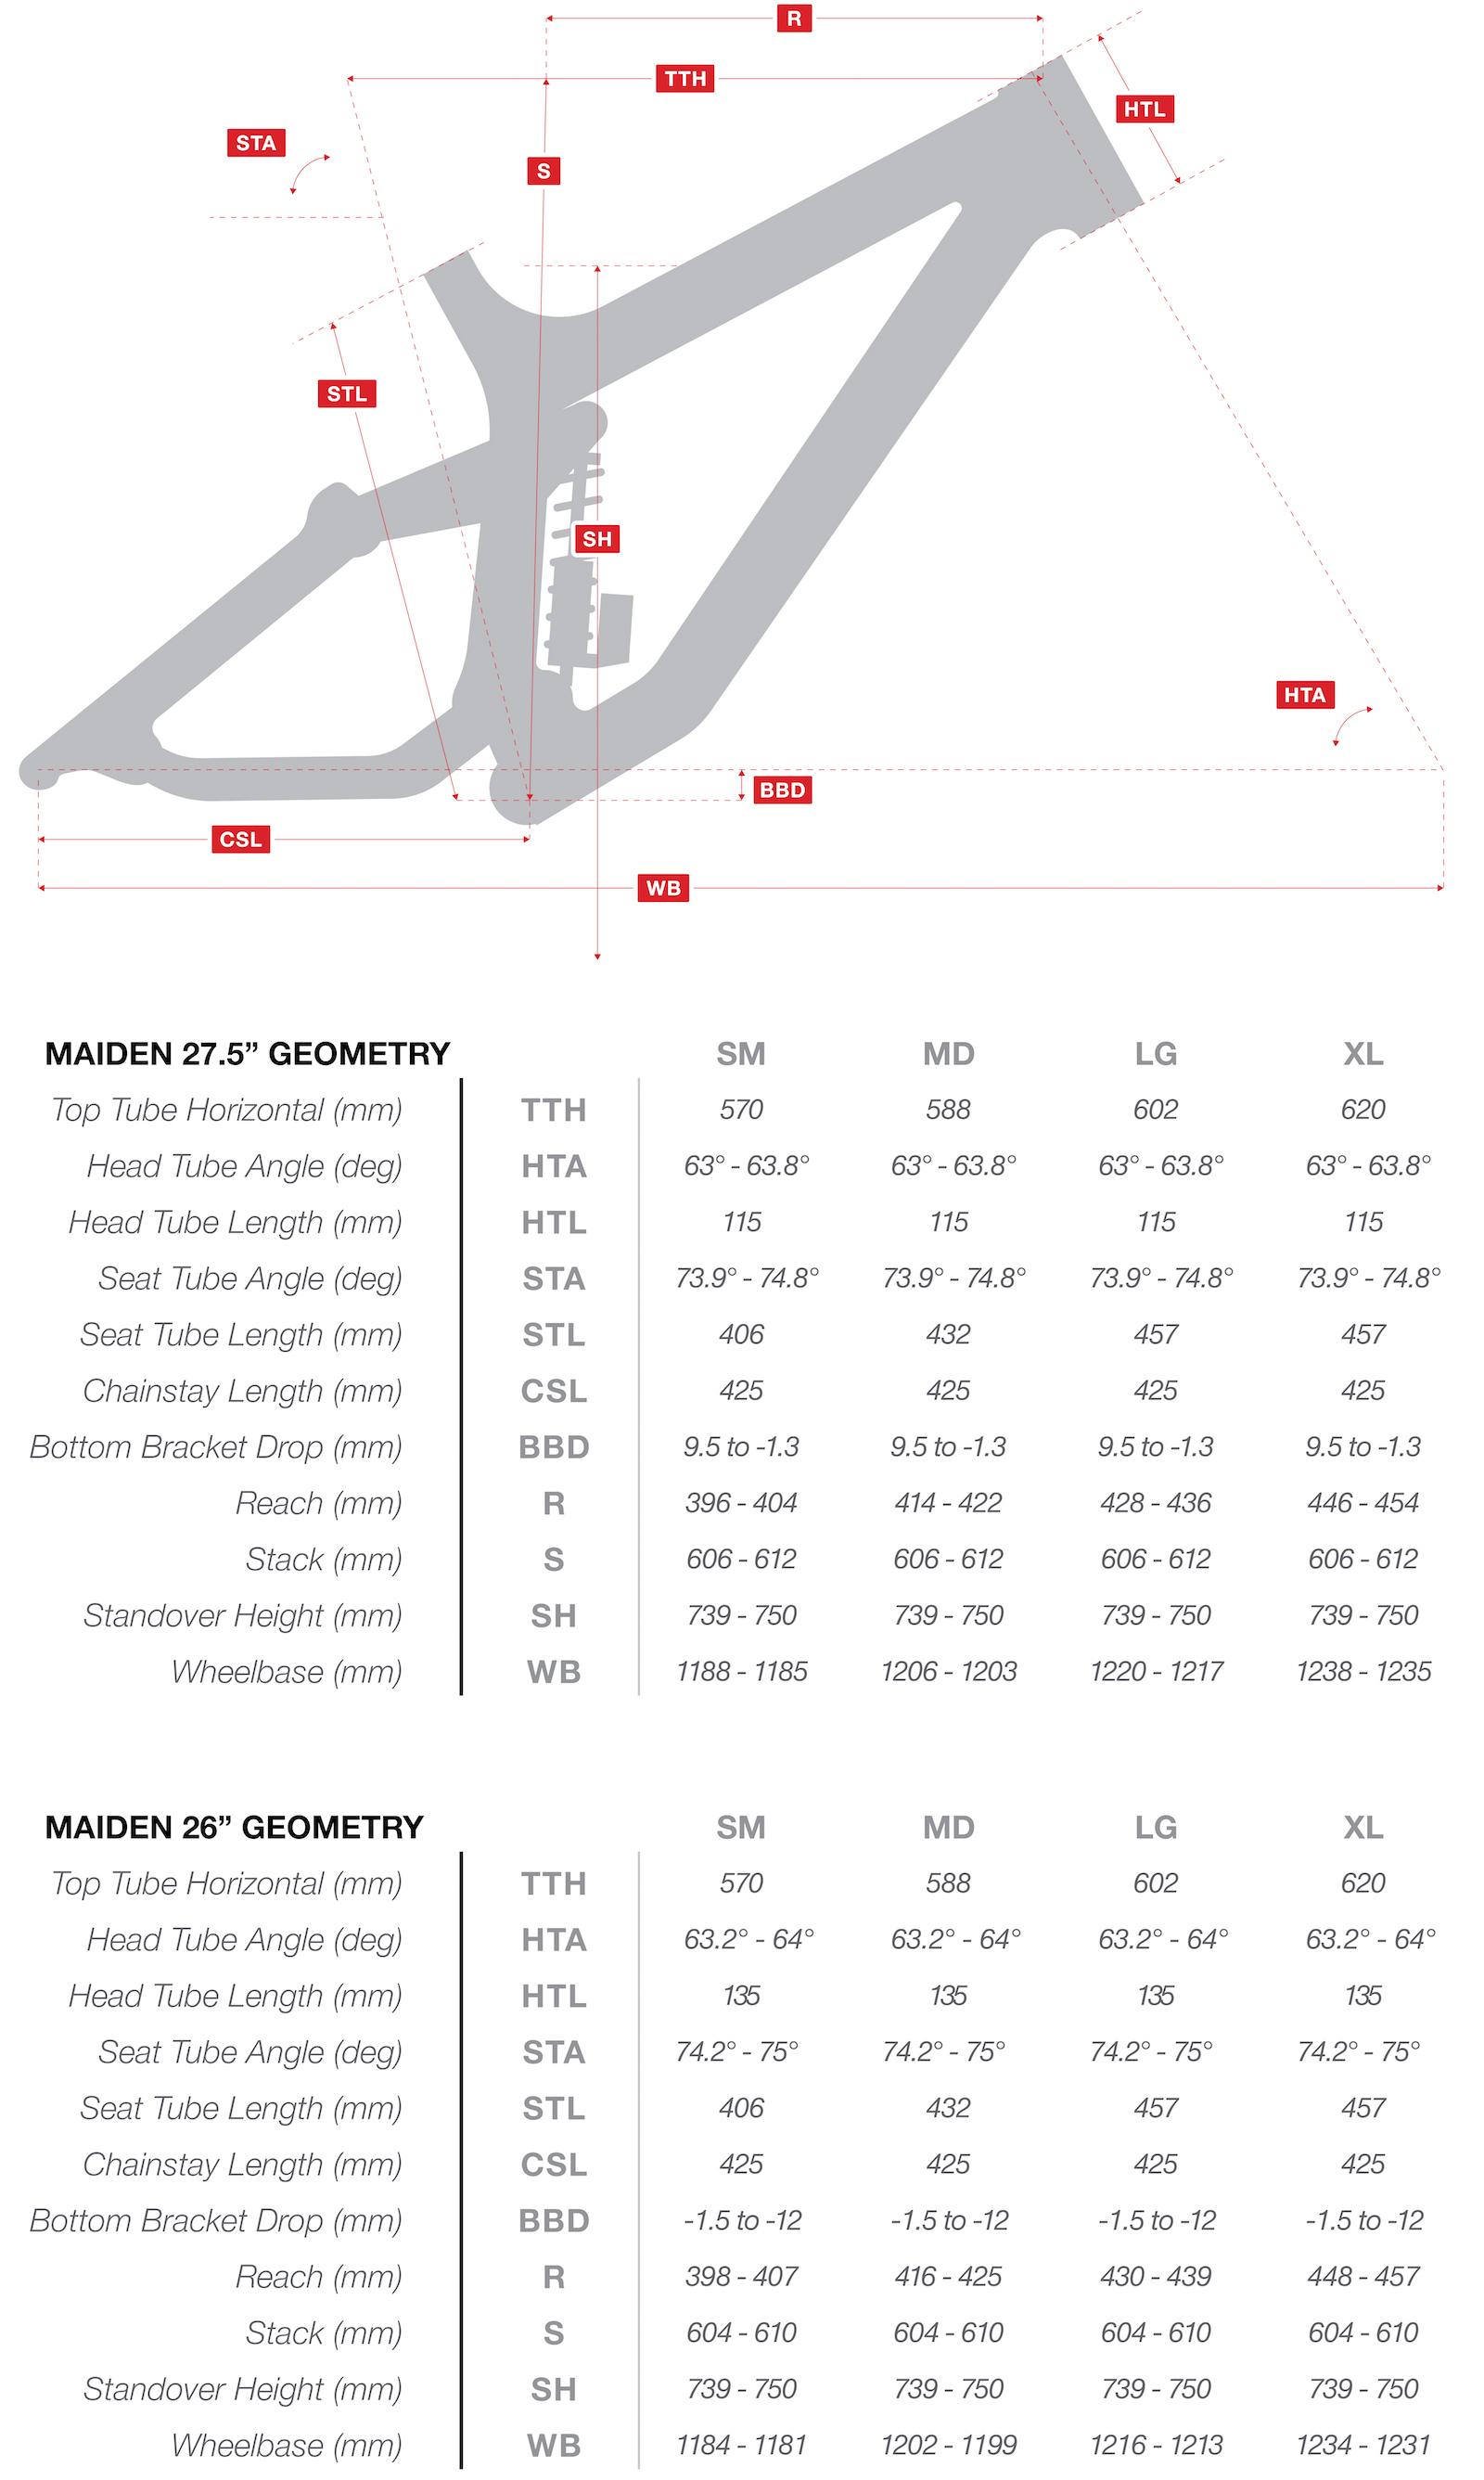 maiden-geometry-27.5